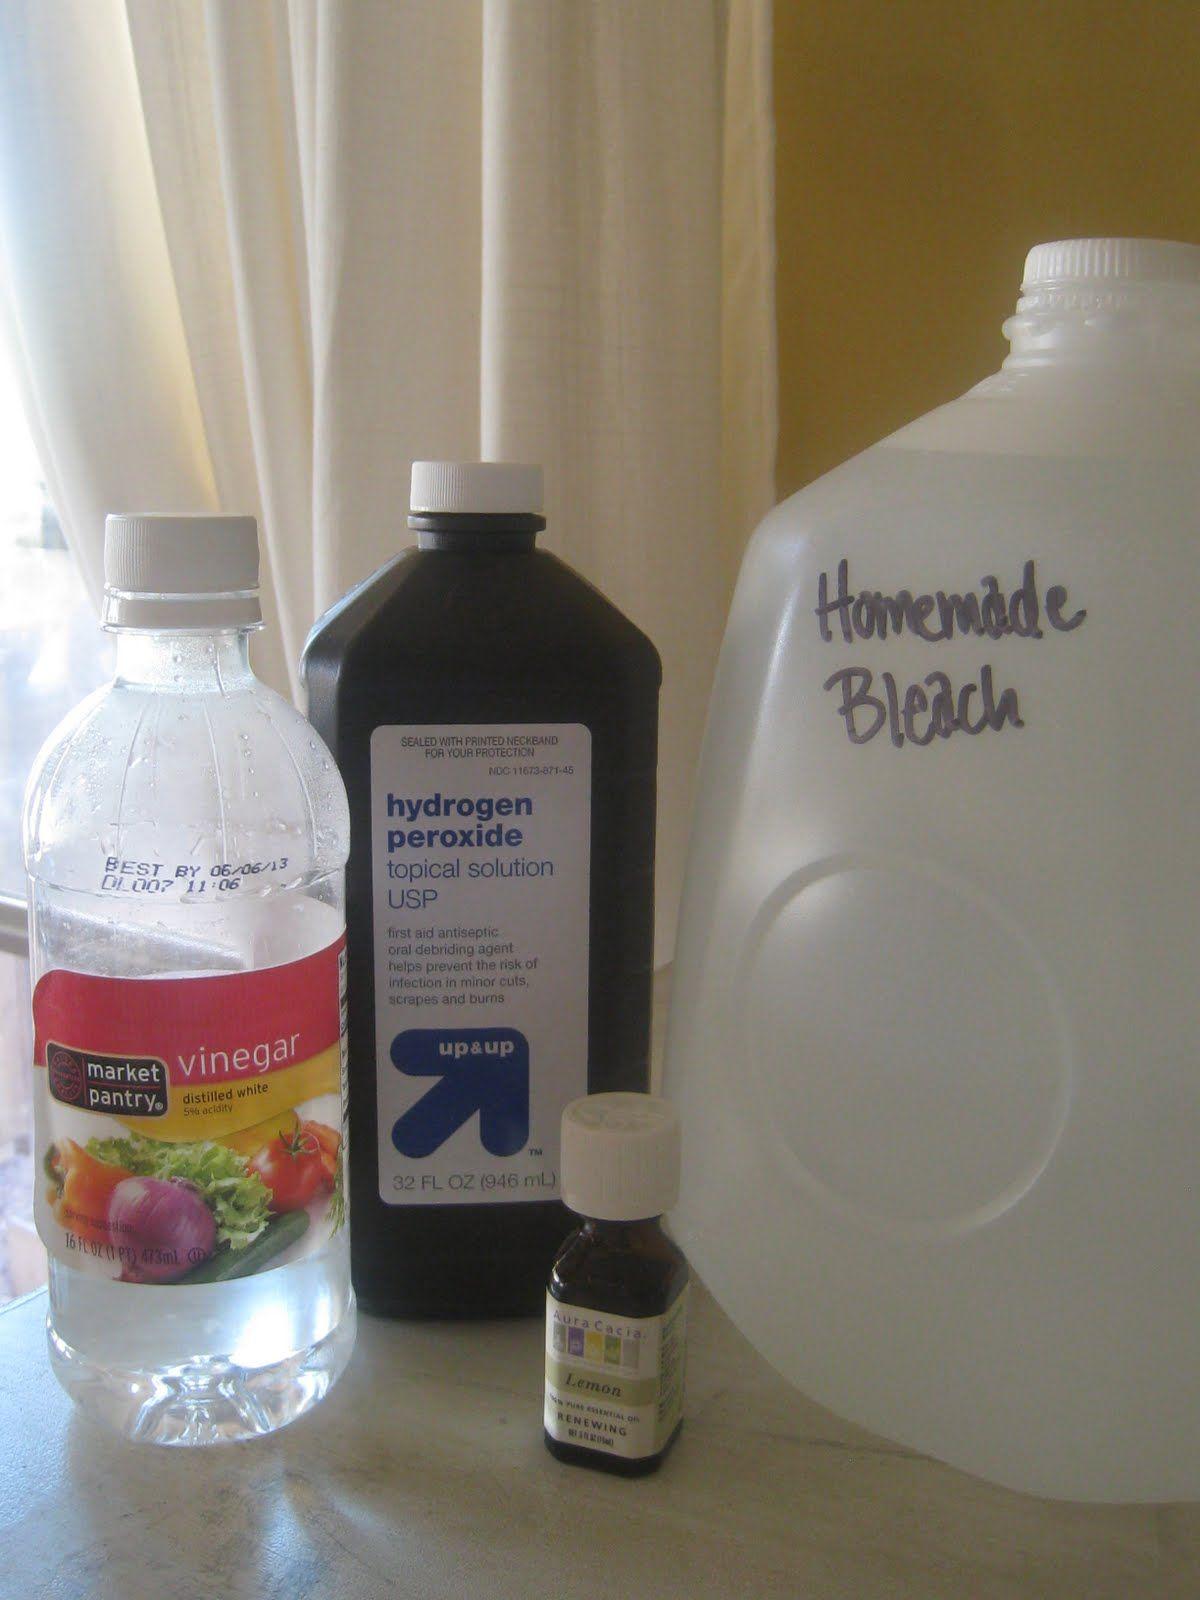 Frugally Sustainable Homemade Bleach Alternative Homemade Bleach Homemade Bleach Alternative Bleach Alternative